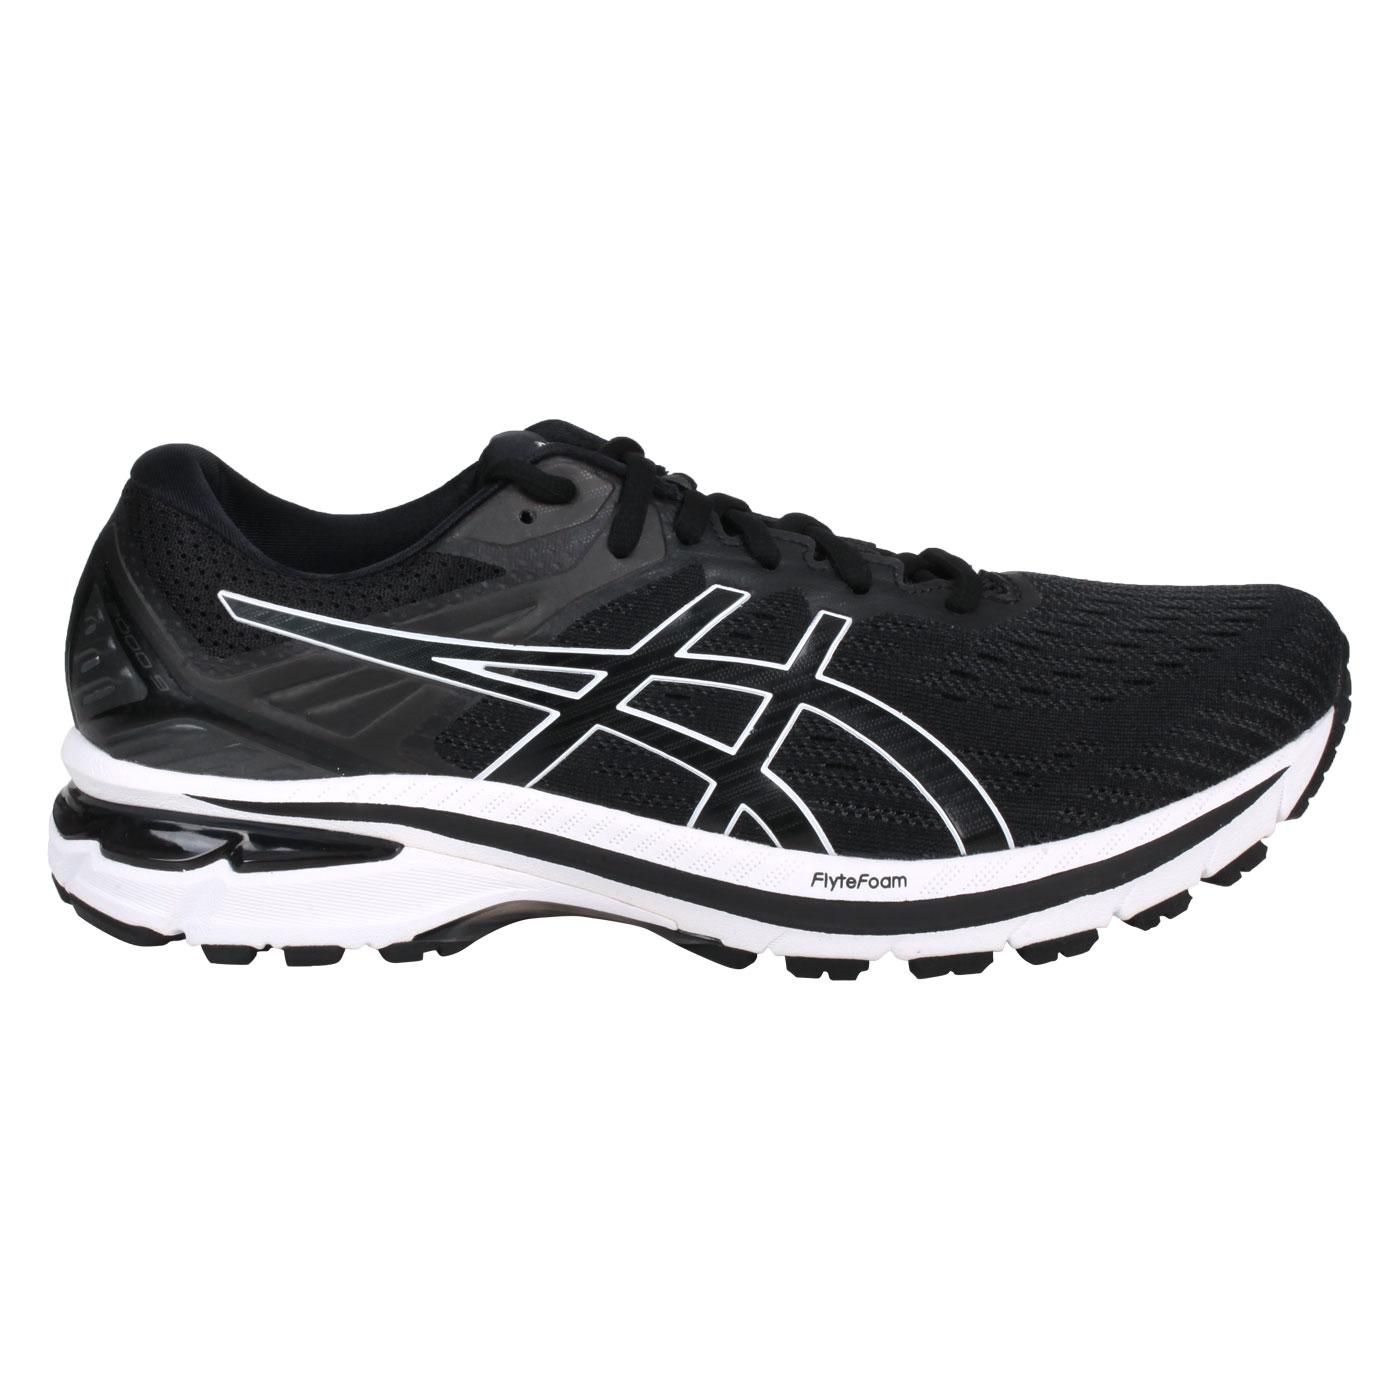 ASICS 男款慢跑鞋-4E  @GT-2000 9@1011A987-001 - 黑白